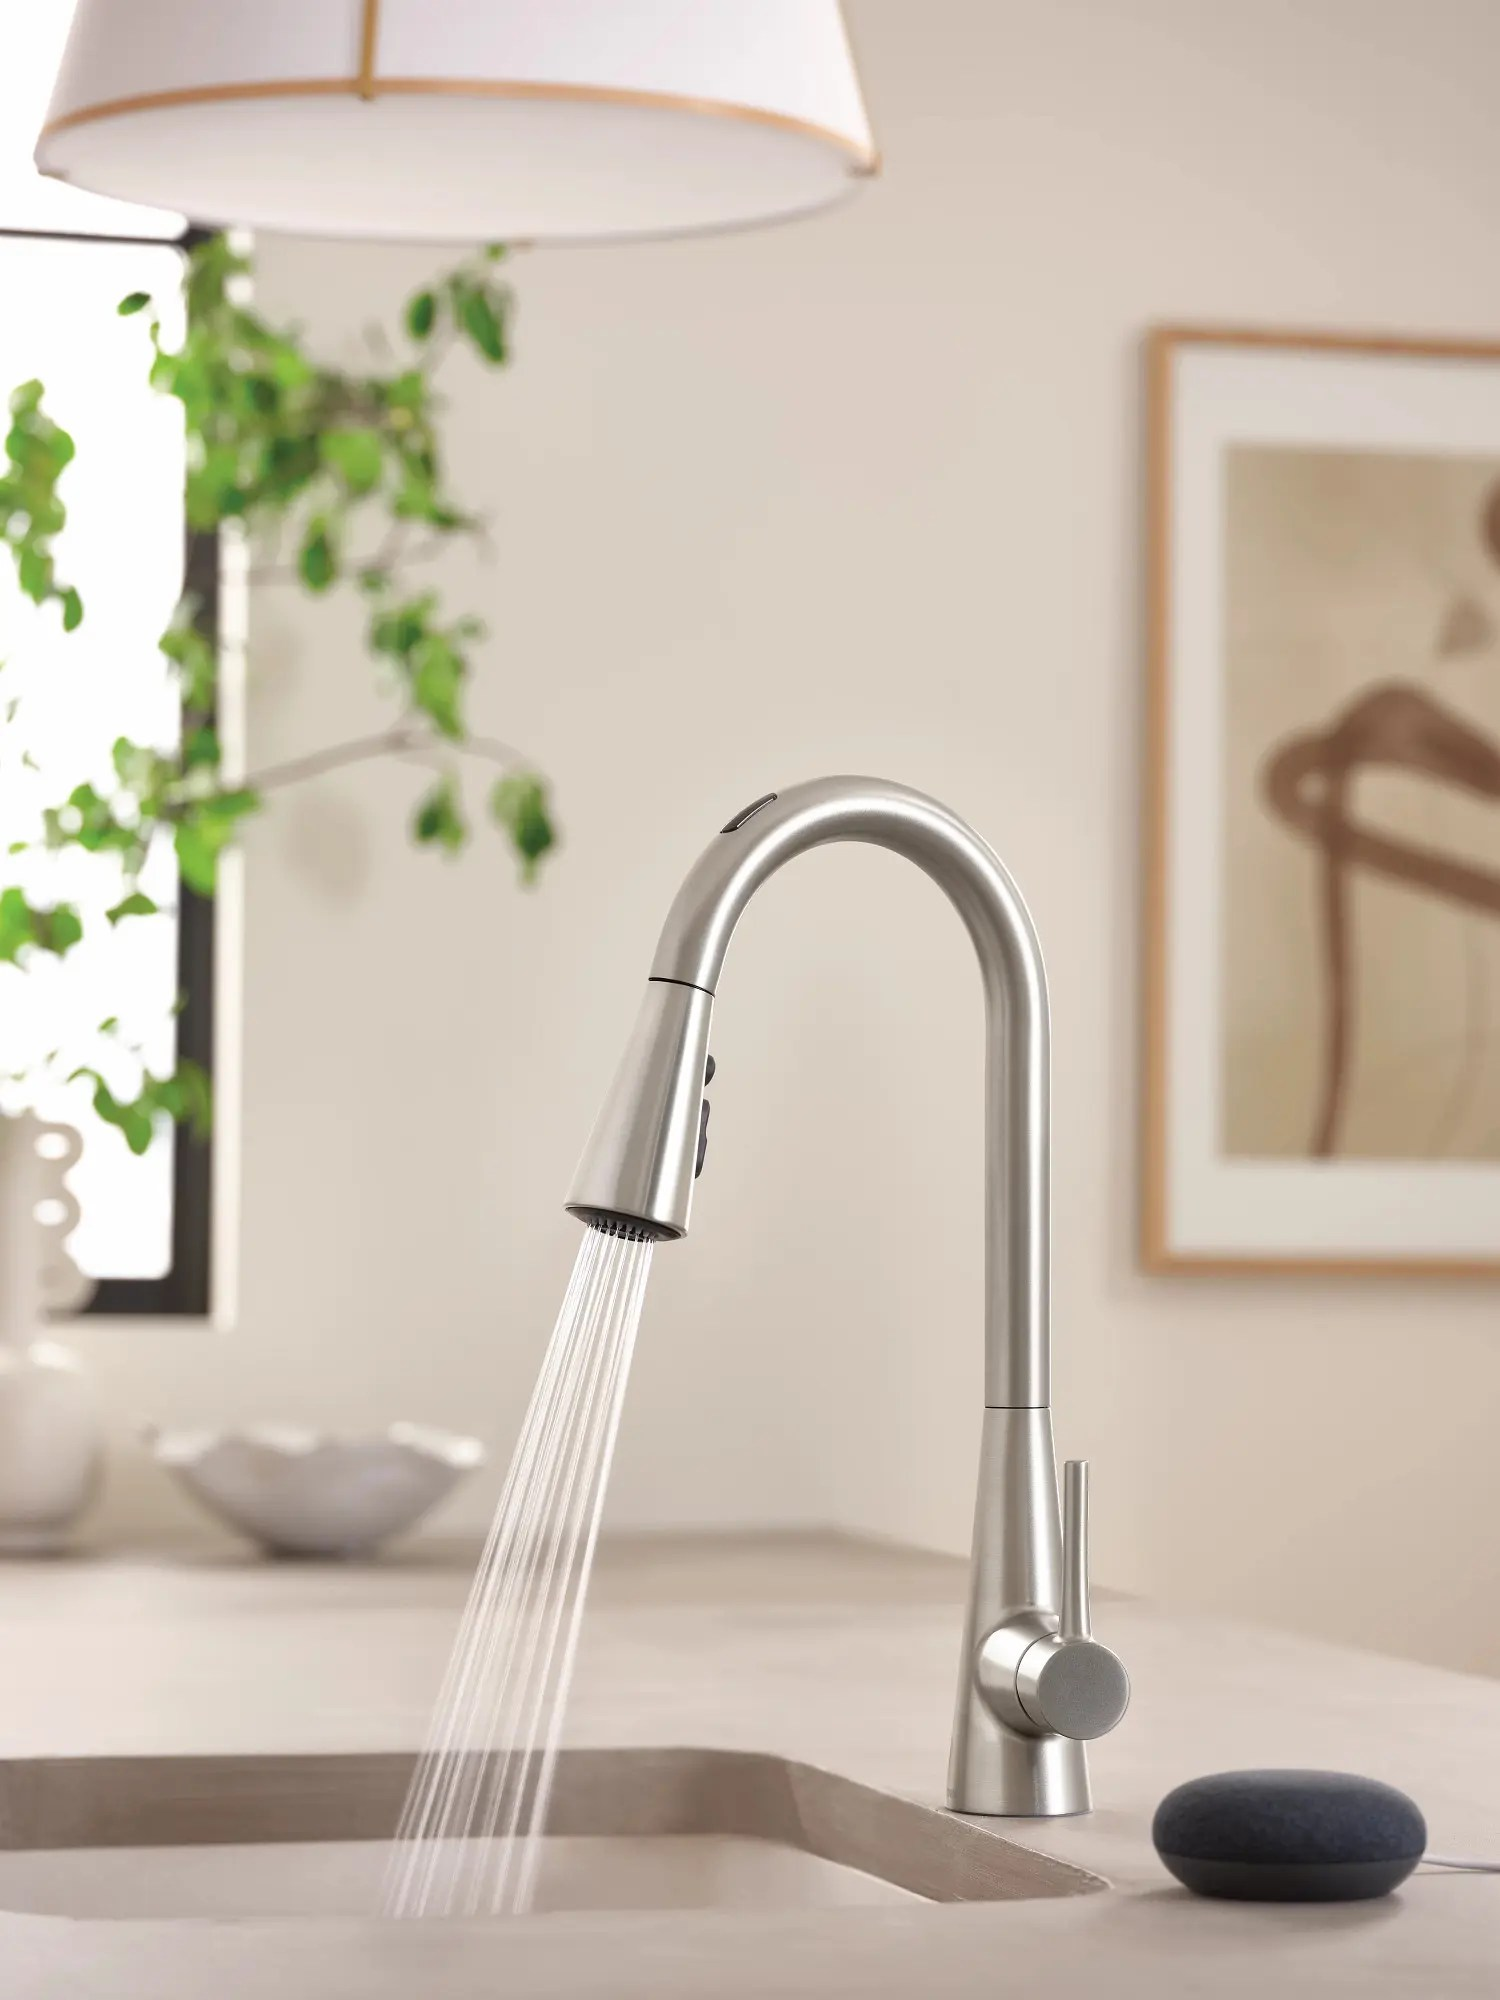 u by moen smart faucet in sarai spot resist stainless